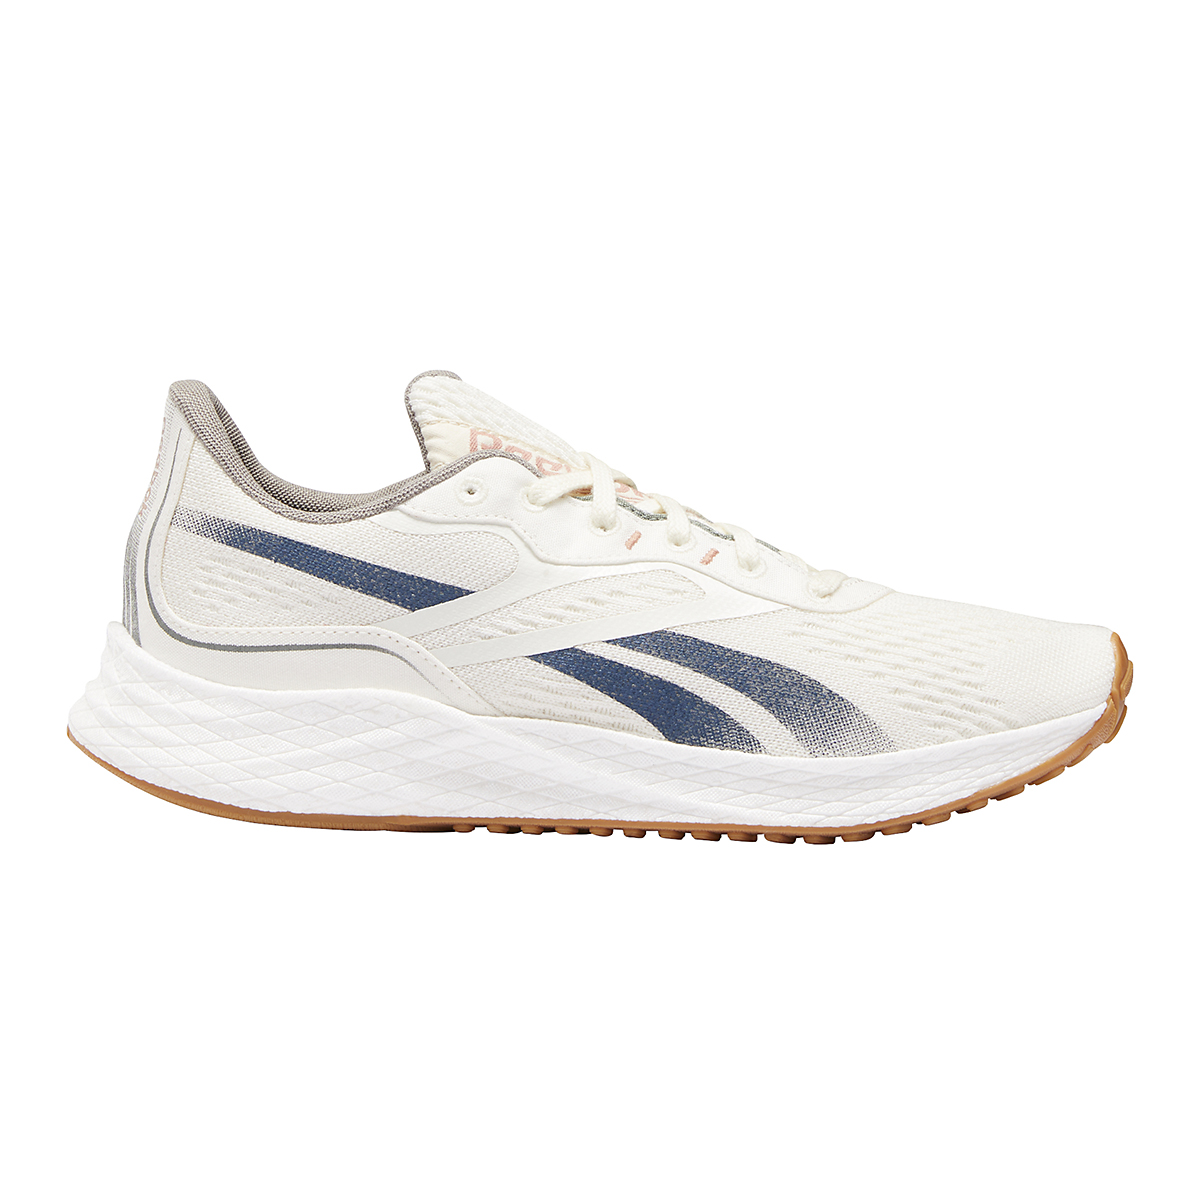 Men's Reebok Floatride Energy Grow Running Shoe - Color: Classic White/Brave Blue/Boulder Grey - Size: 7 - Width: Regular, Classic White/Brave Blue/Boulder Grey, large, image 1